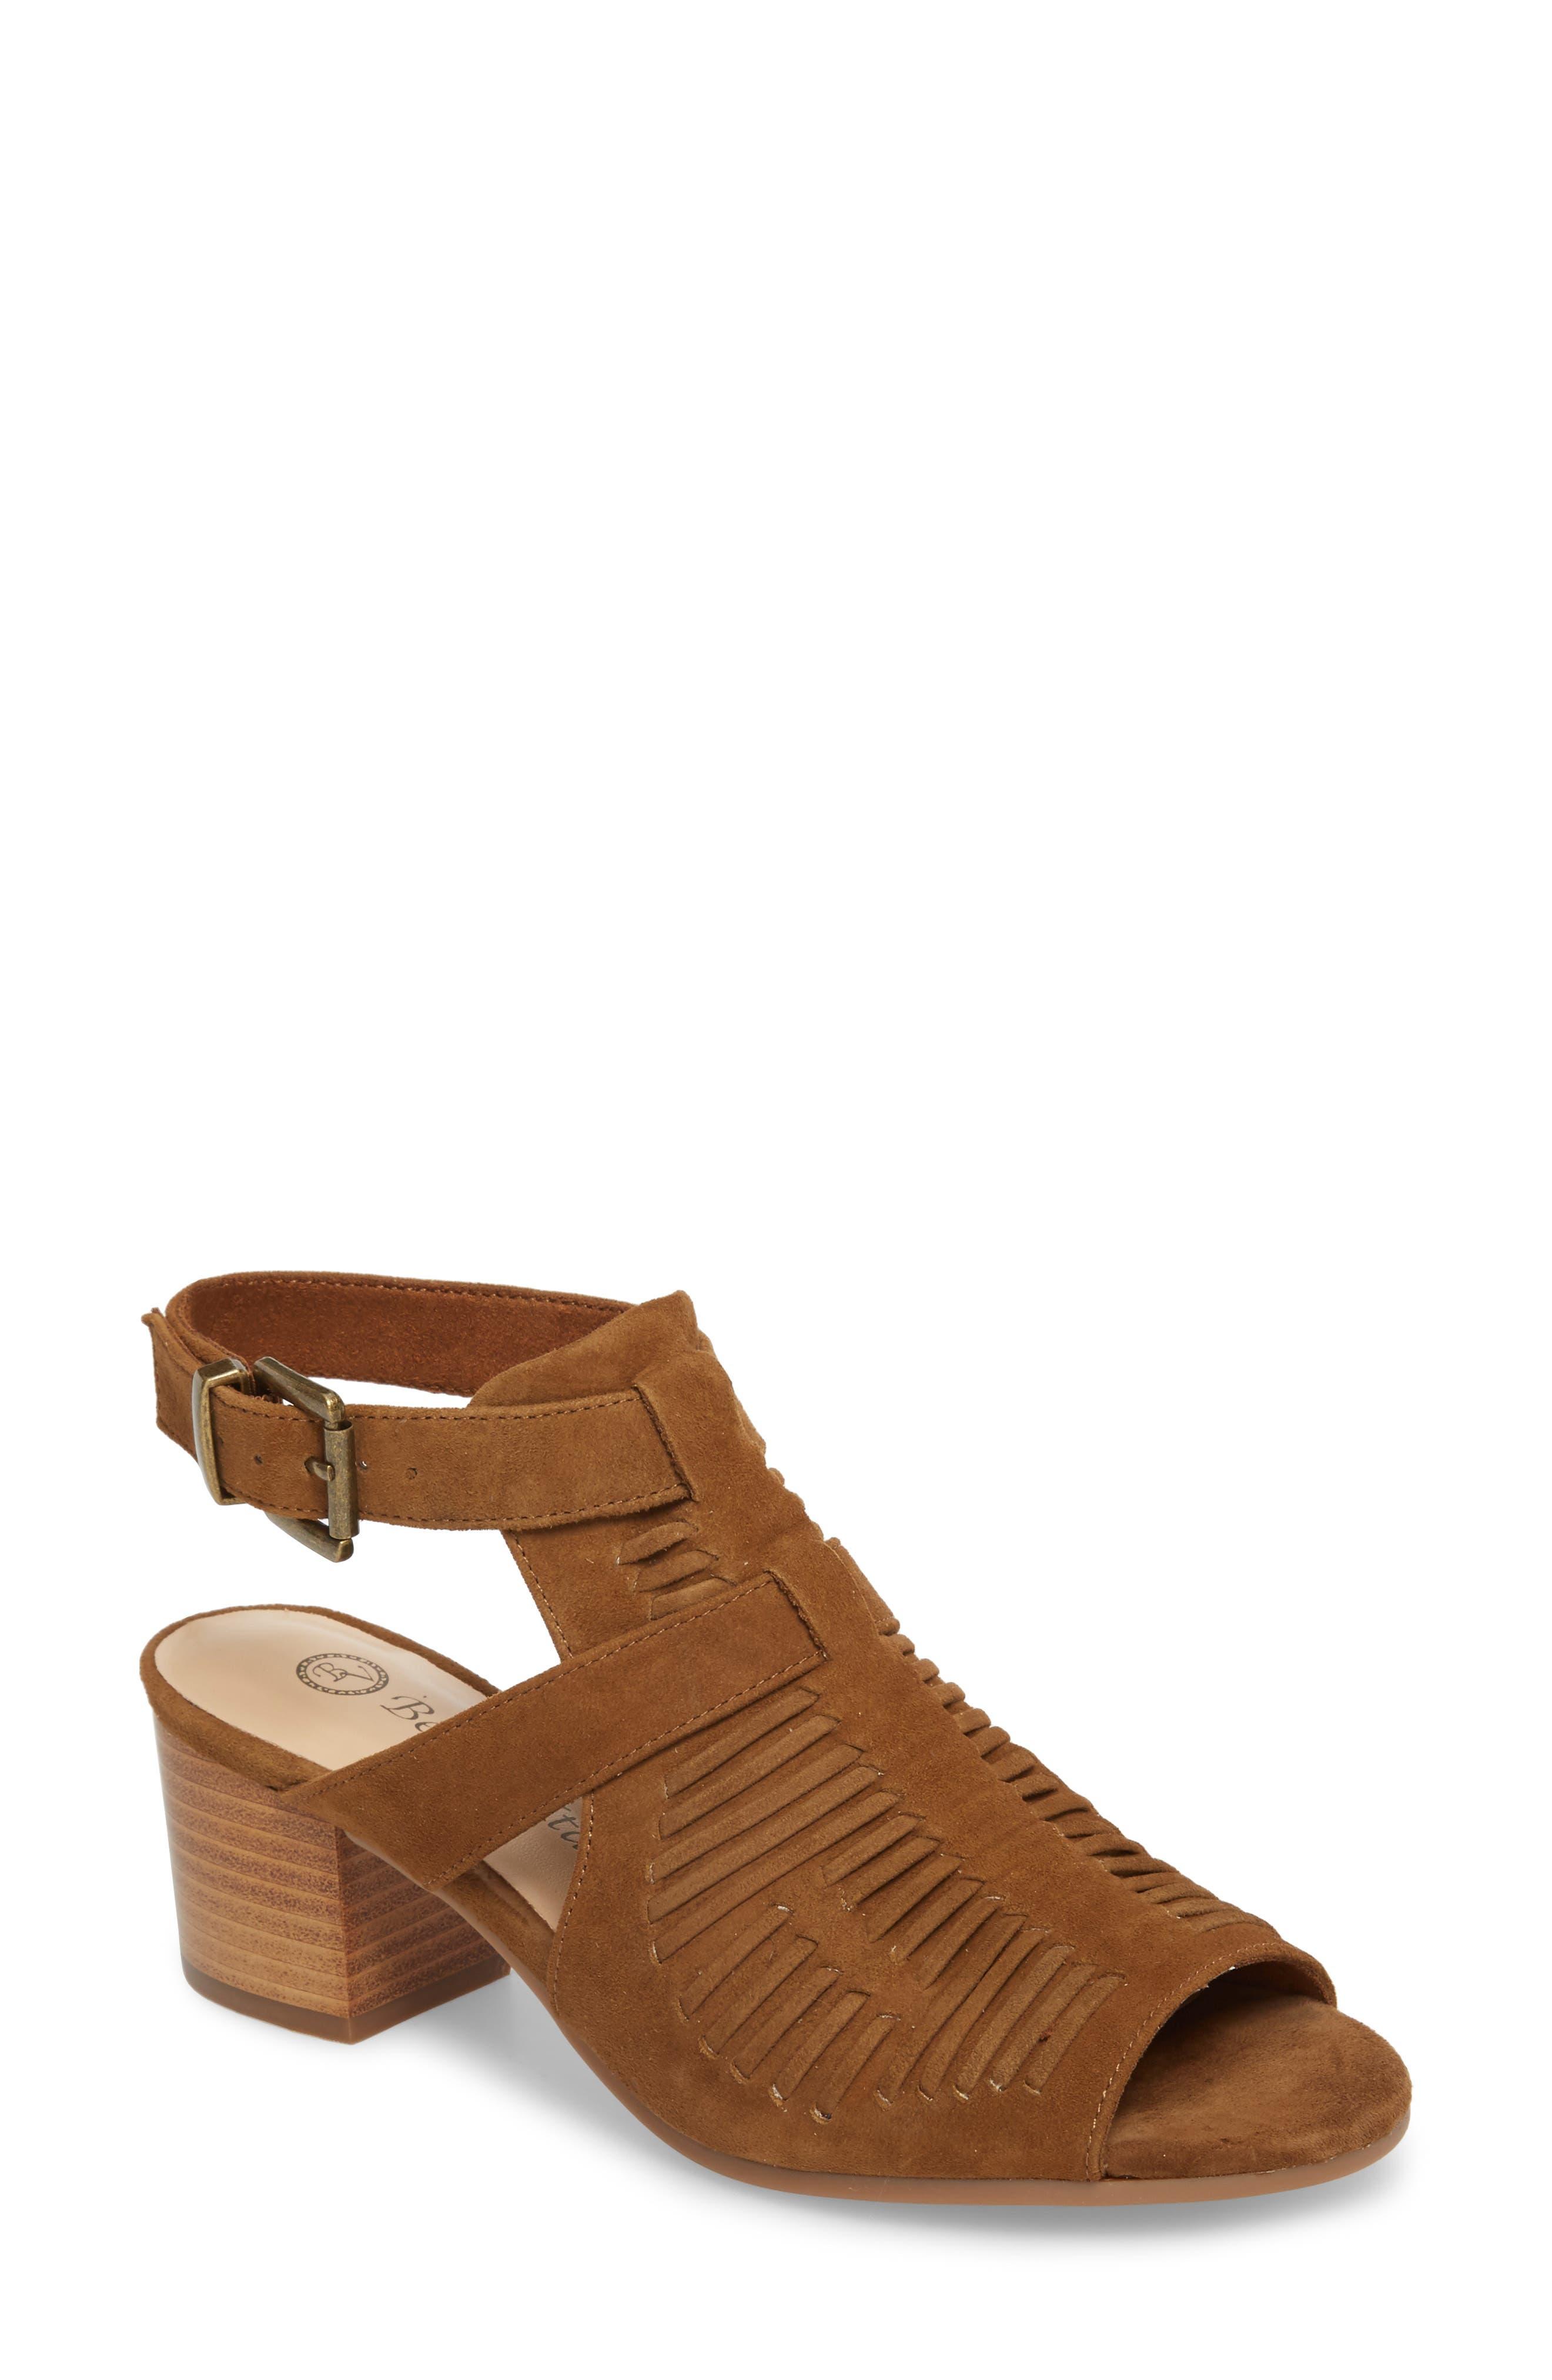 Finley Ankle Strap Sandal,                             Main thumbnail 2, color,